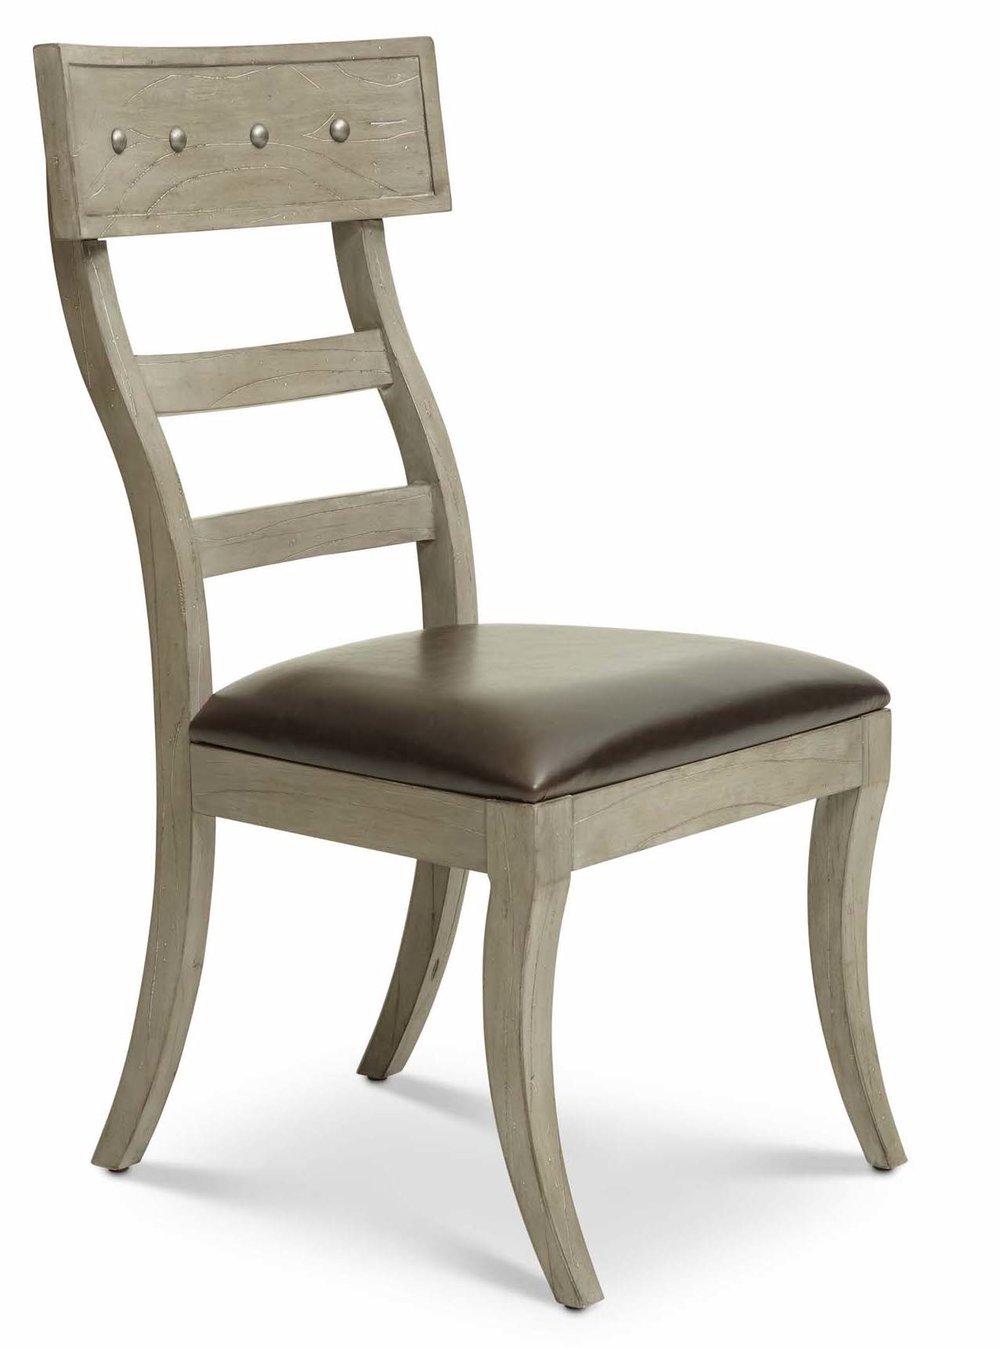 "Aspen Side Chair (2/carton)  Item: DI-167205 Dimensions:22 x 25 x 41.5""H"